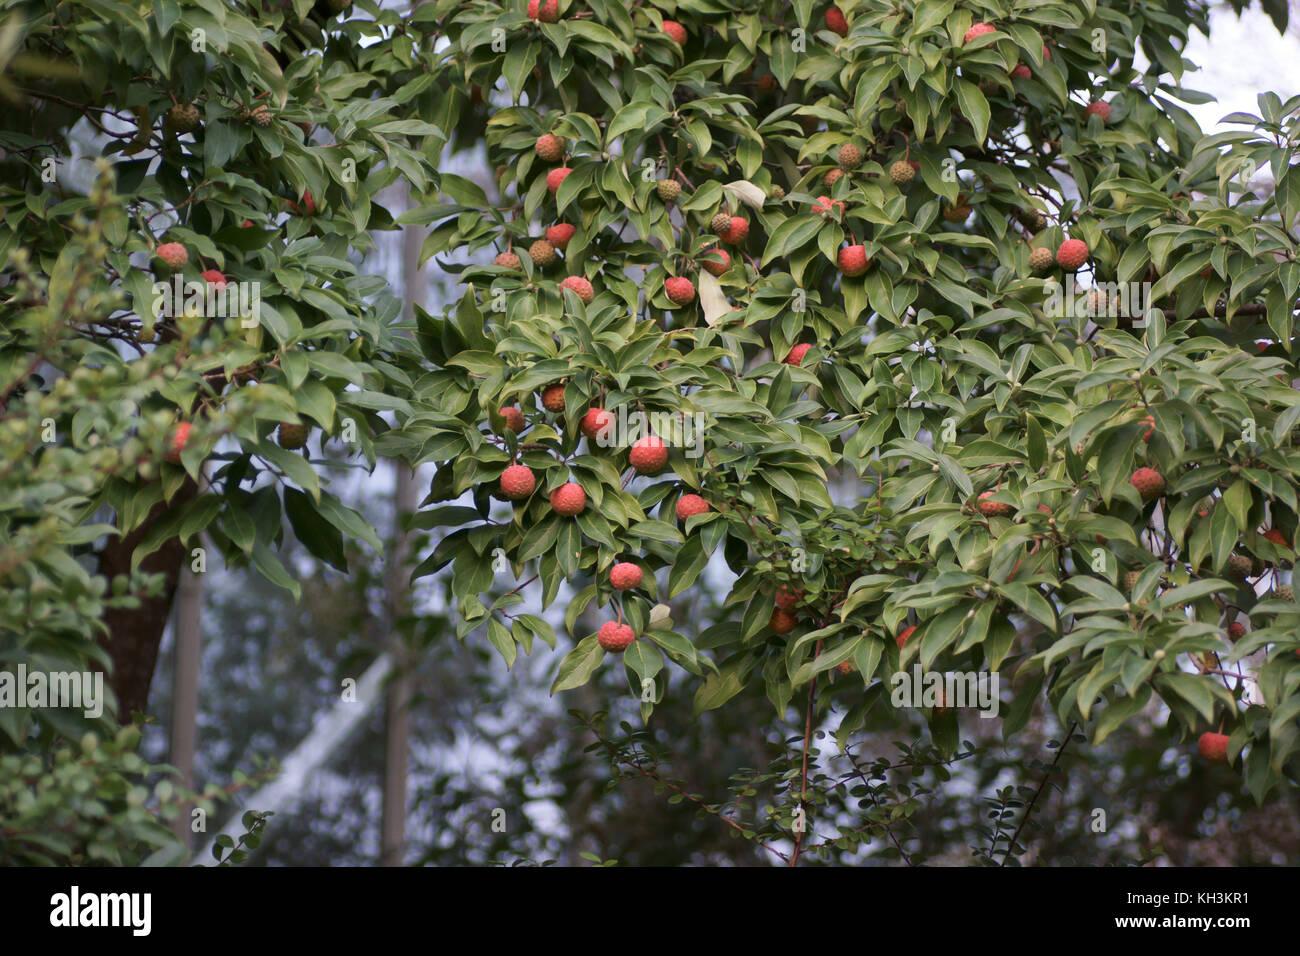 Fruits of Cornus capitata (Himalayan Srawberry Tree) - Stock Image